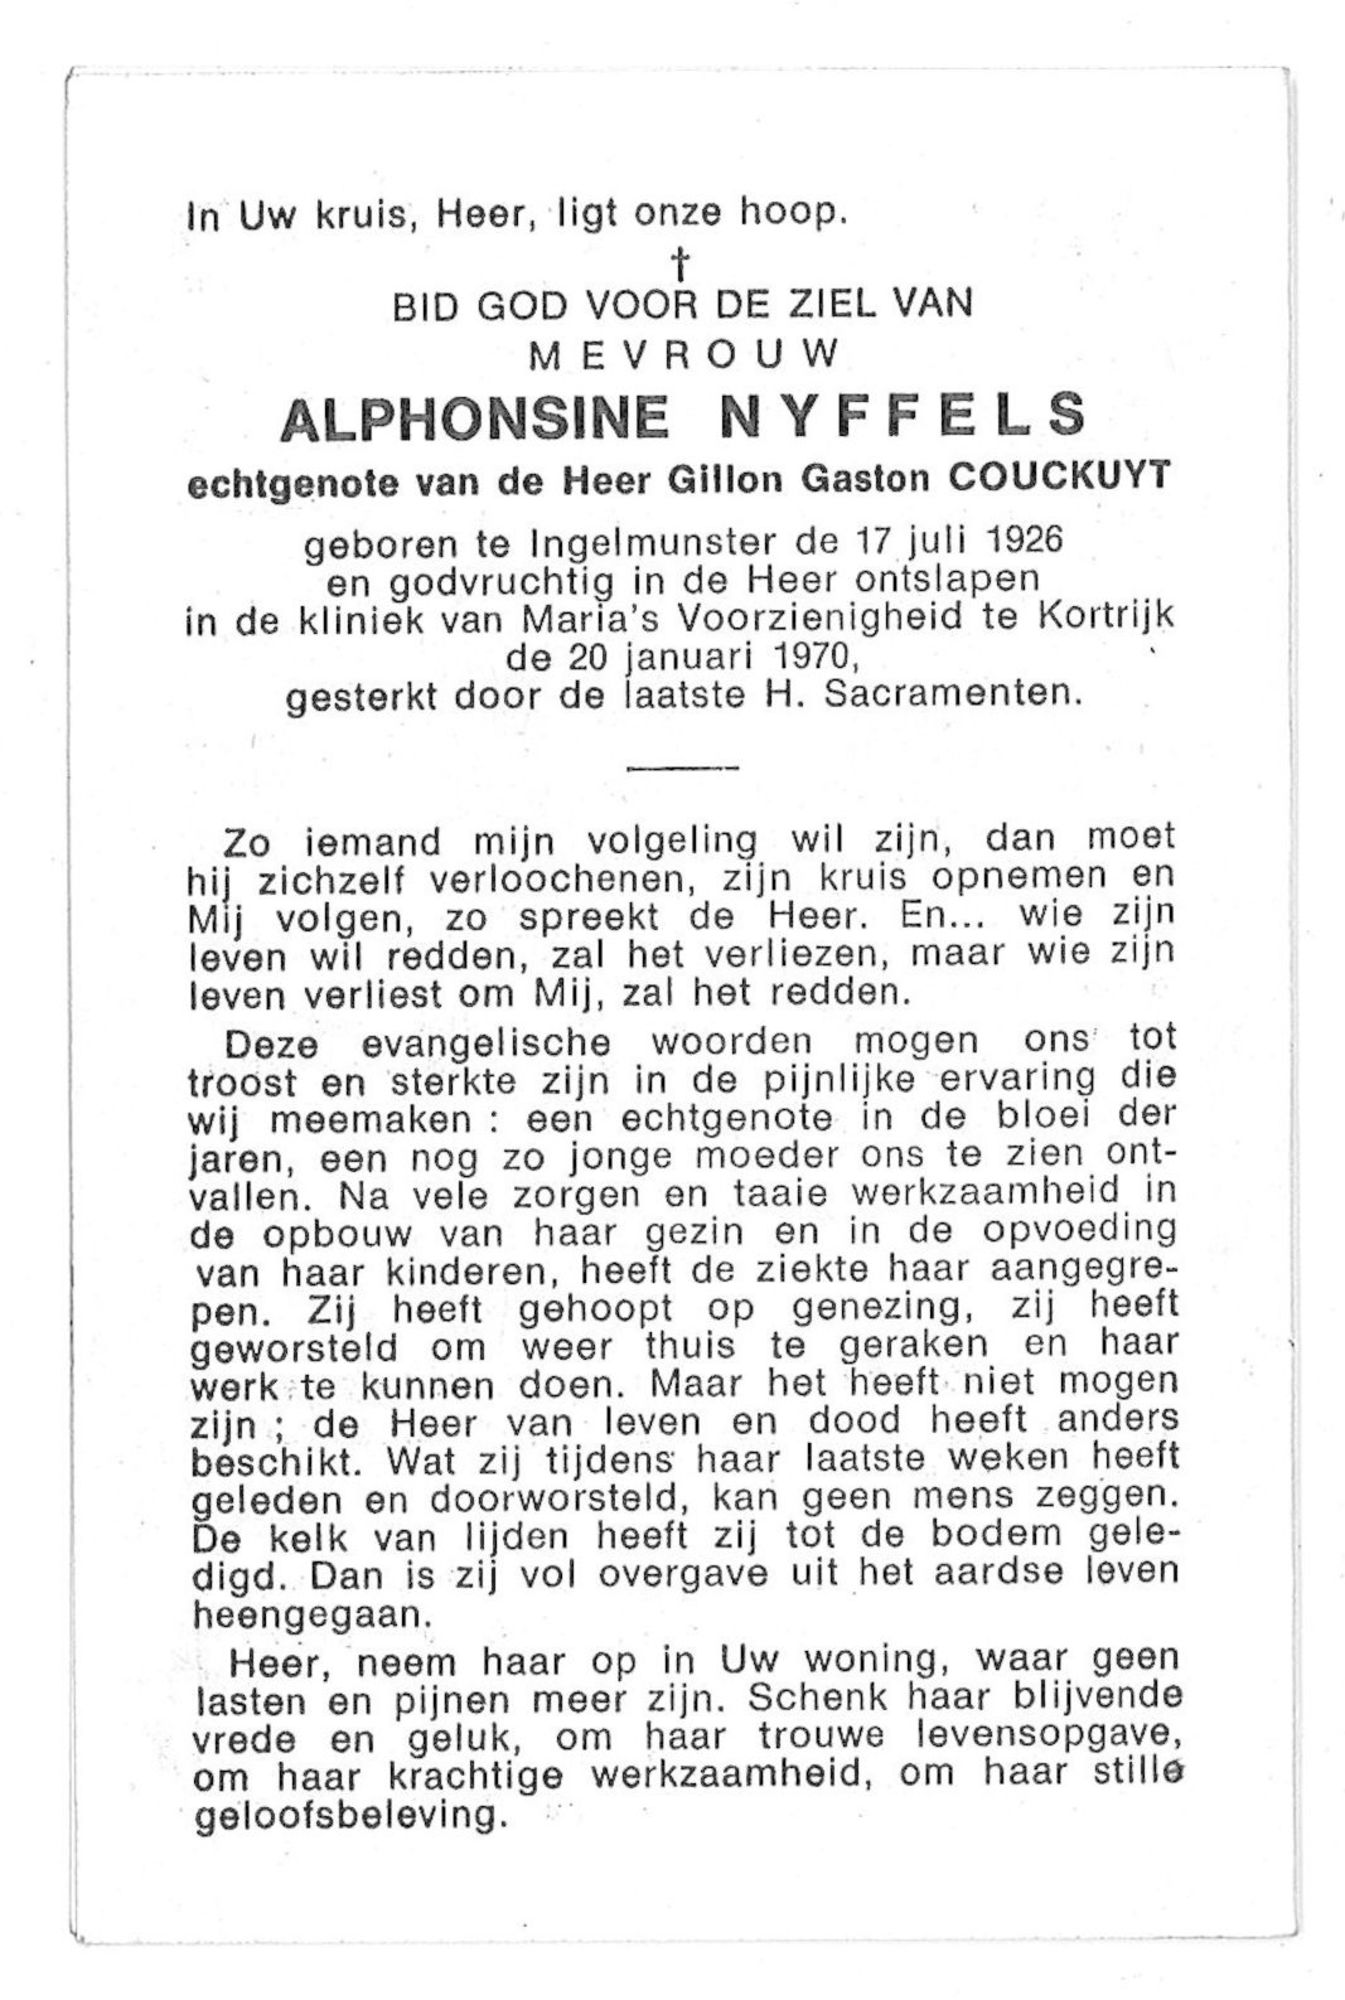 Alphonsine Nyffels